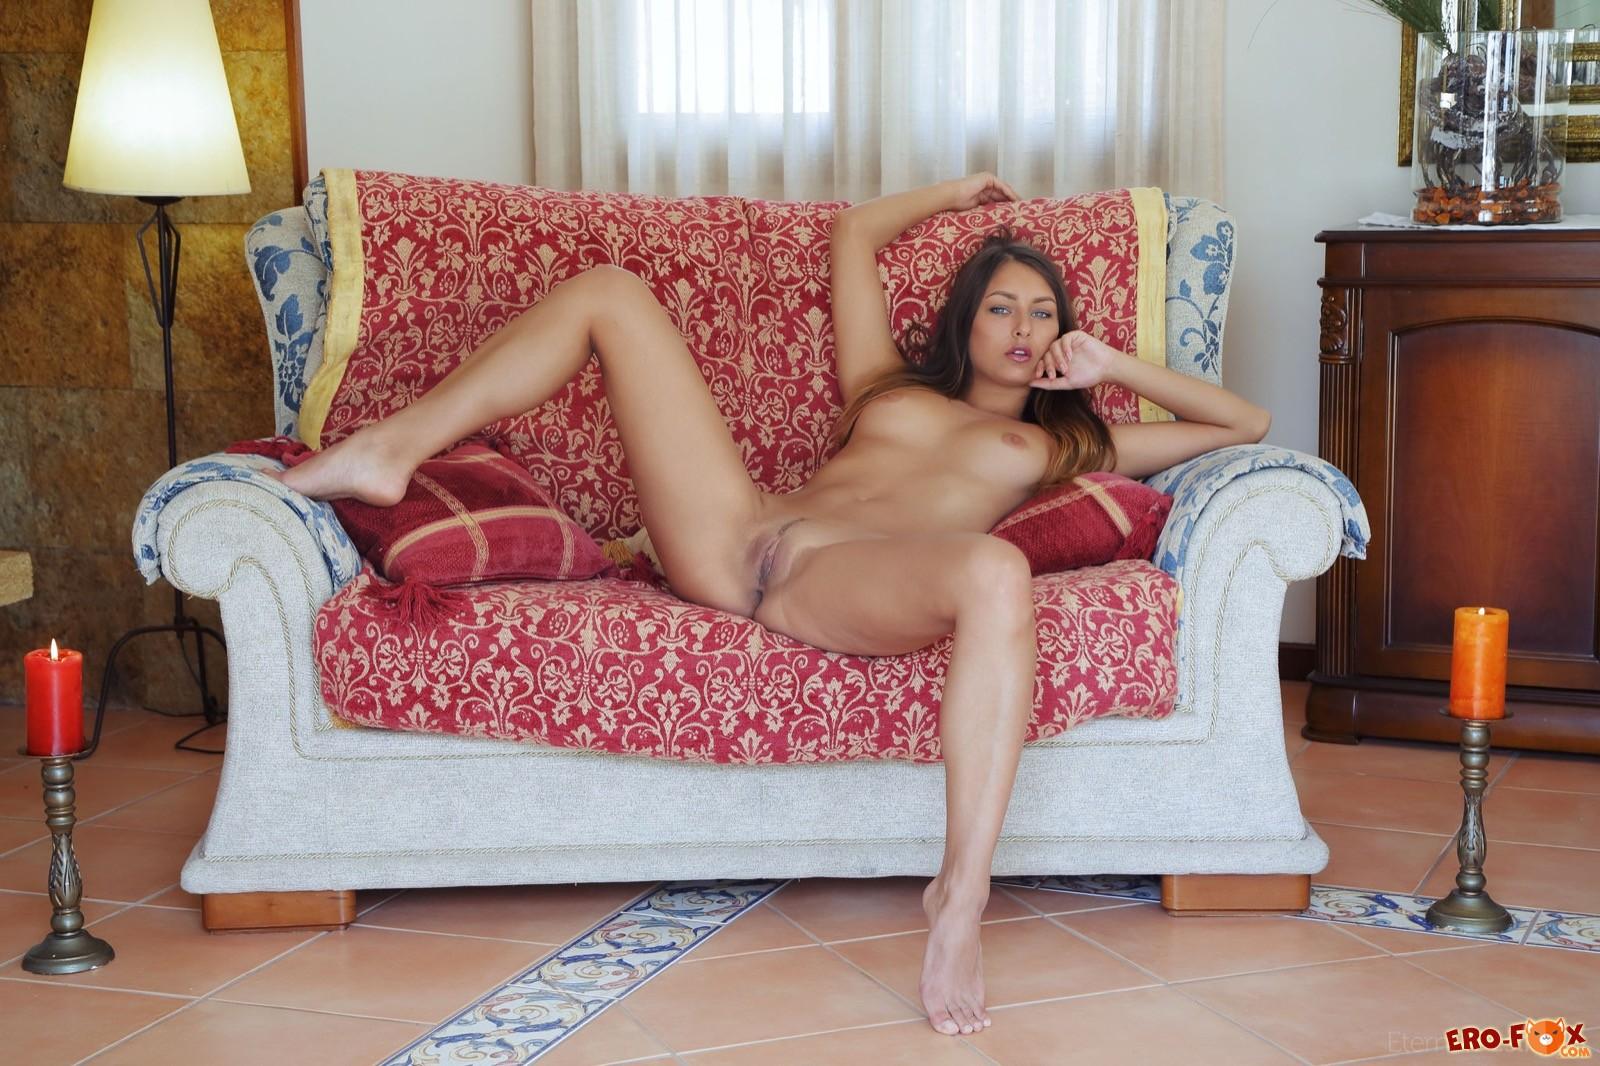 Девушка без трусиков раздвинула ноги на диване